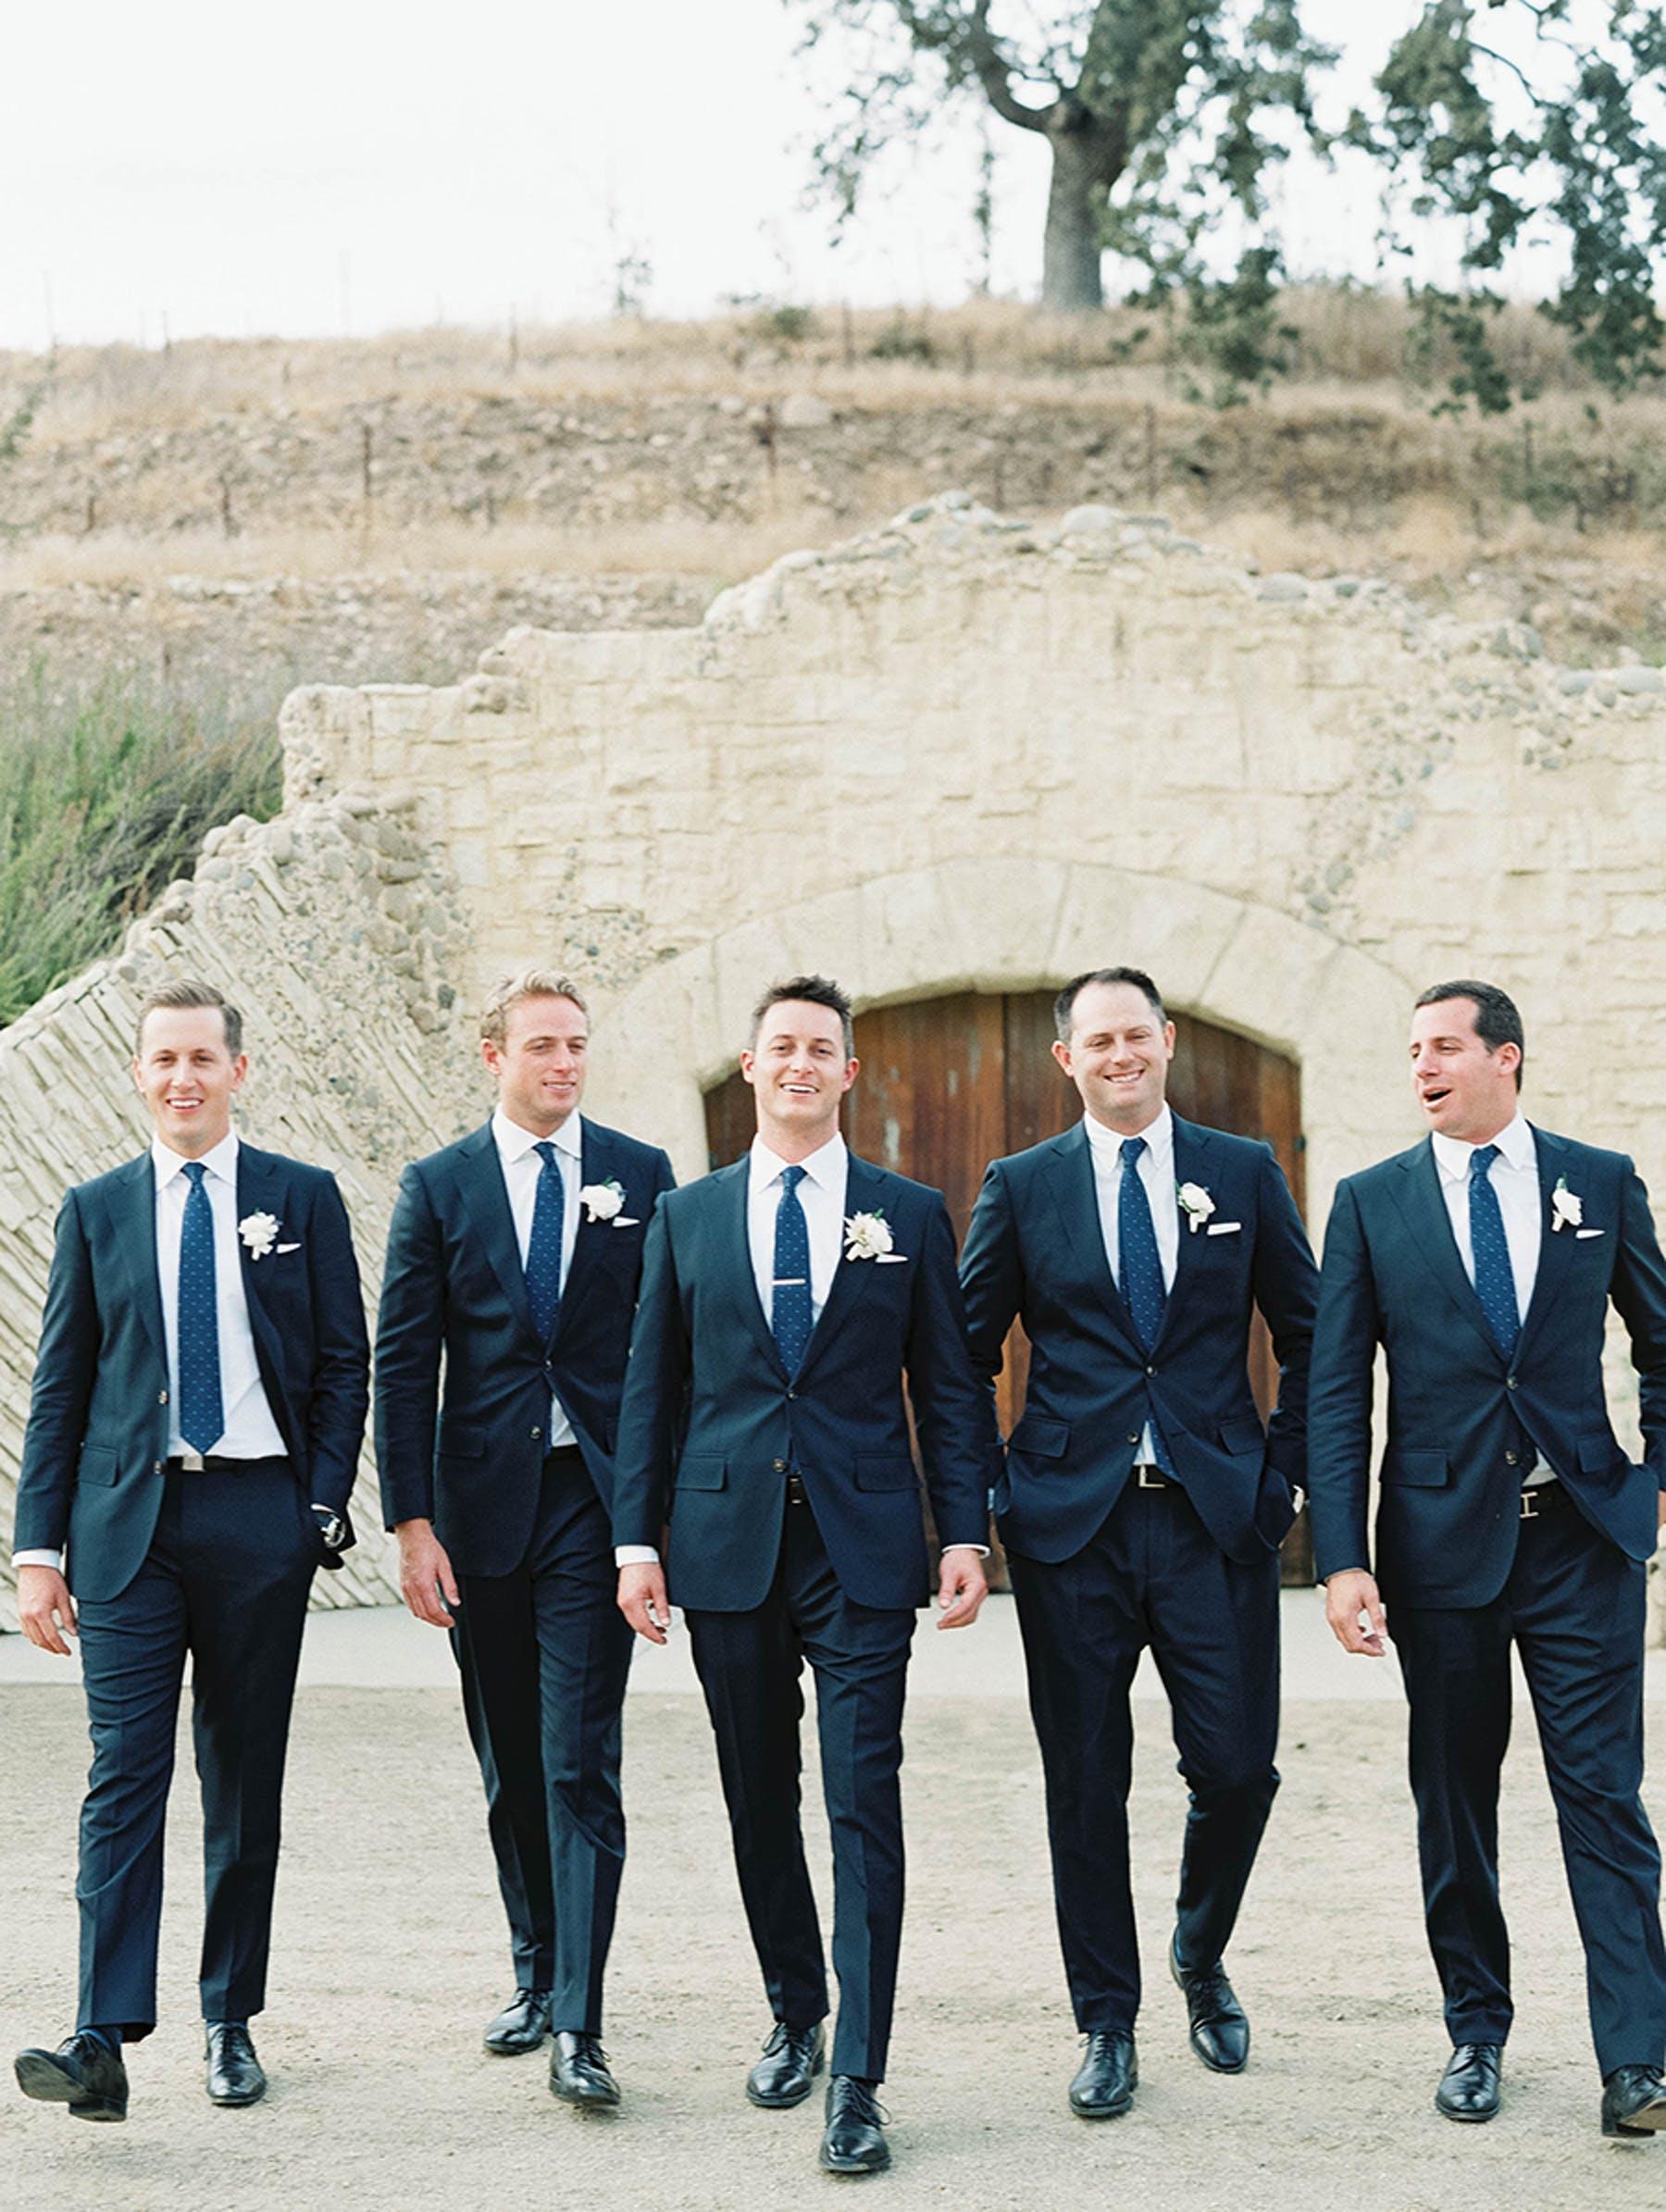 www.santabarbarawedding.com | Sunstone Winery | Luna de Mare | Esoteric Events | Groomsmen